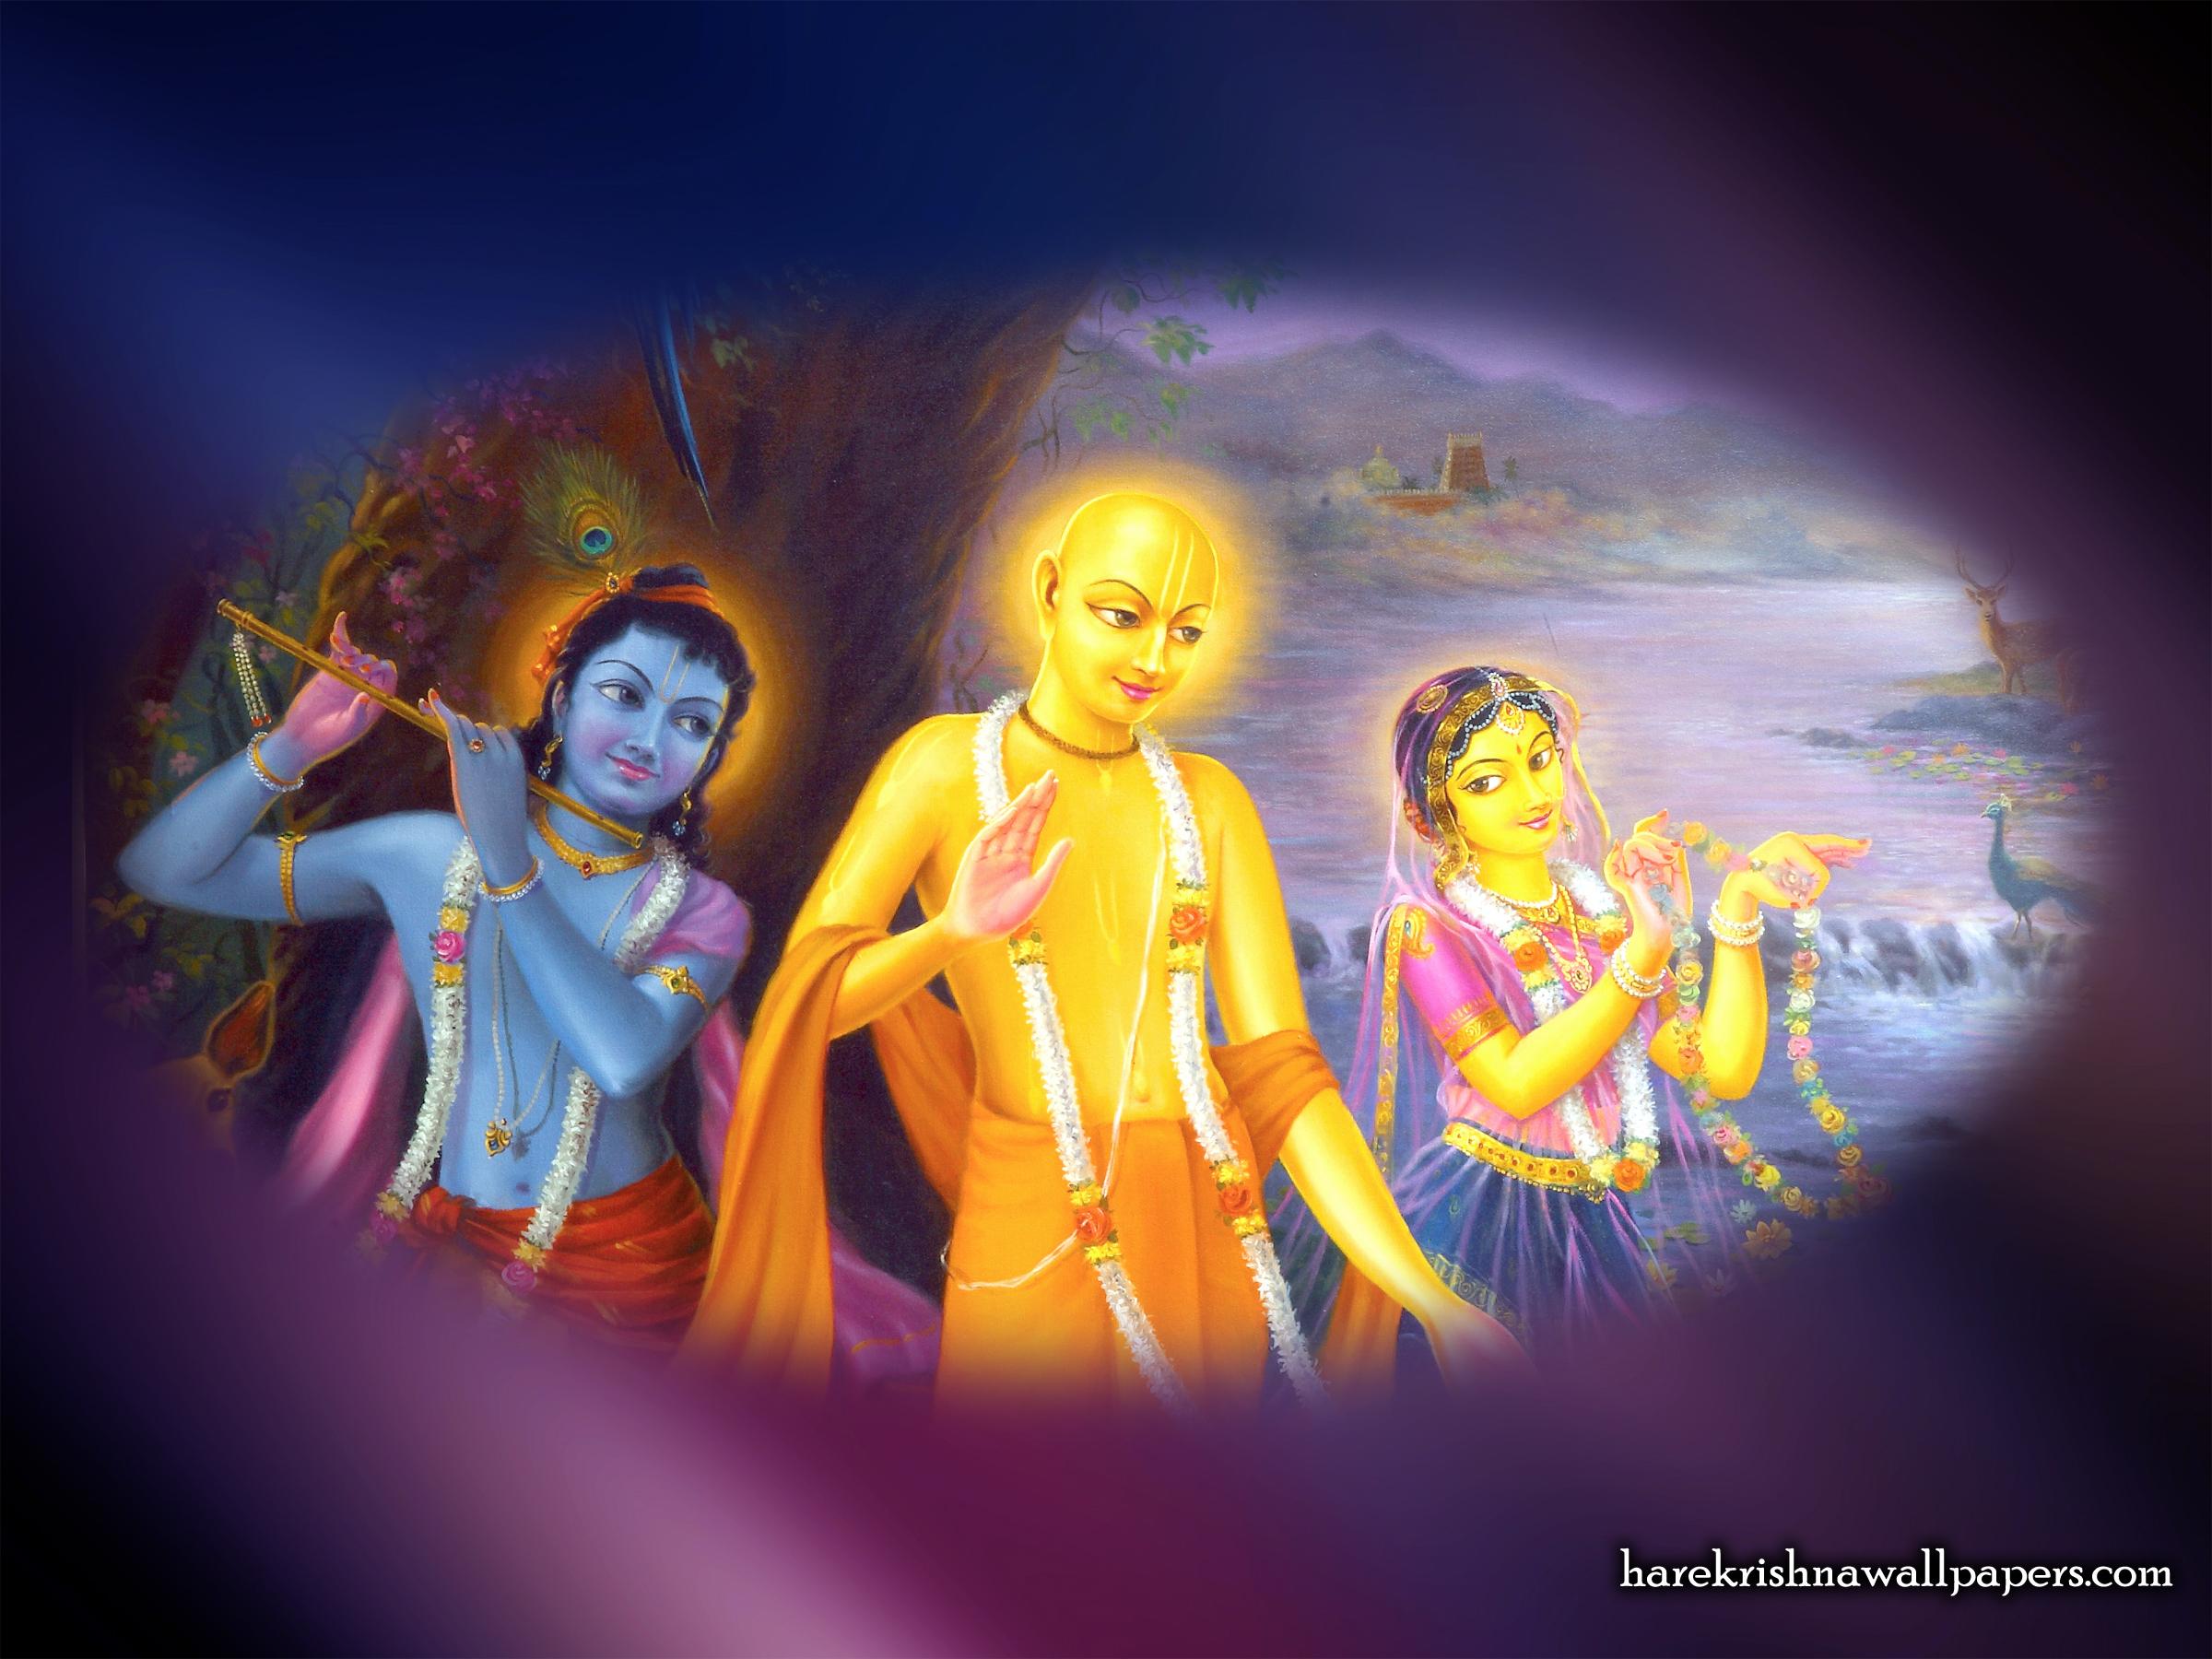 Chaitanya Mahaprabhu Wallpaper (006) Size 2400x1800 Download